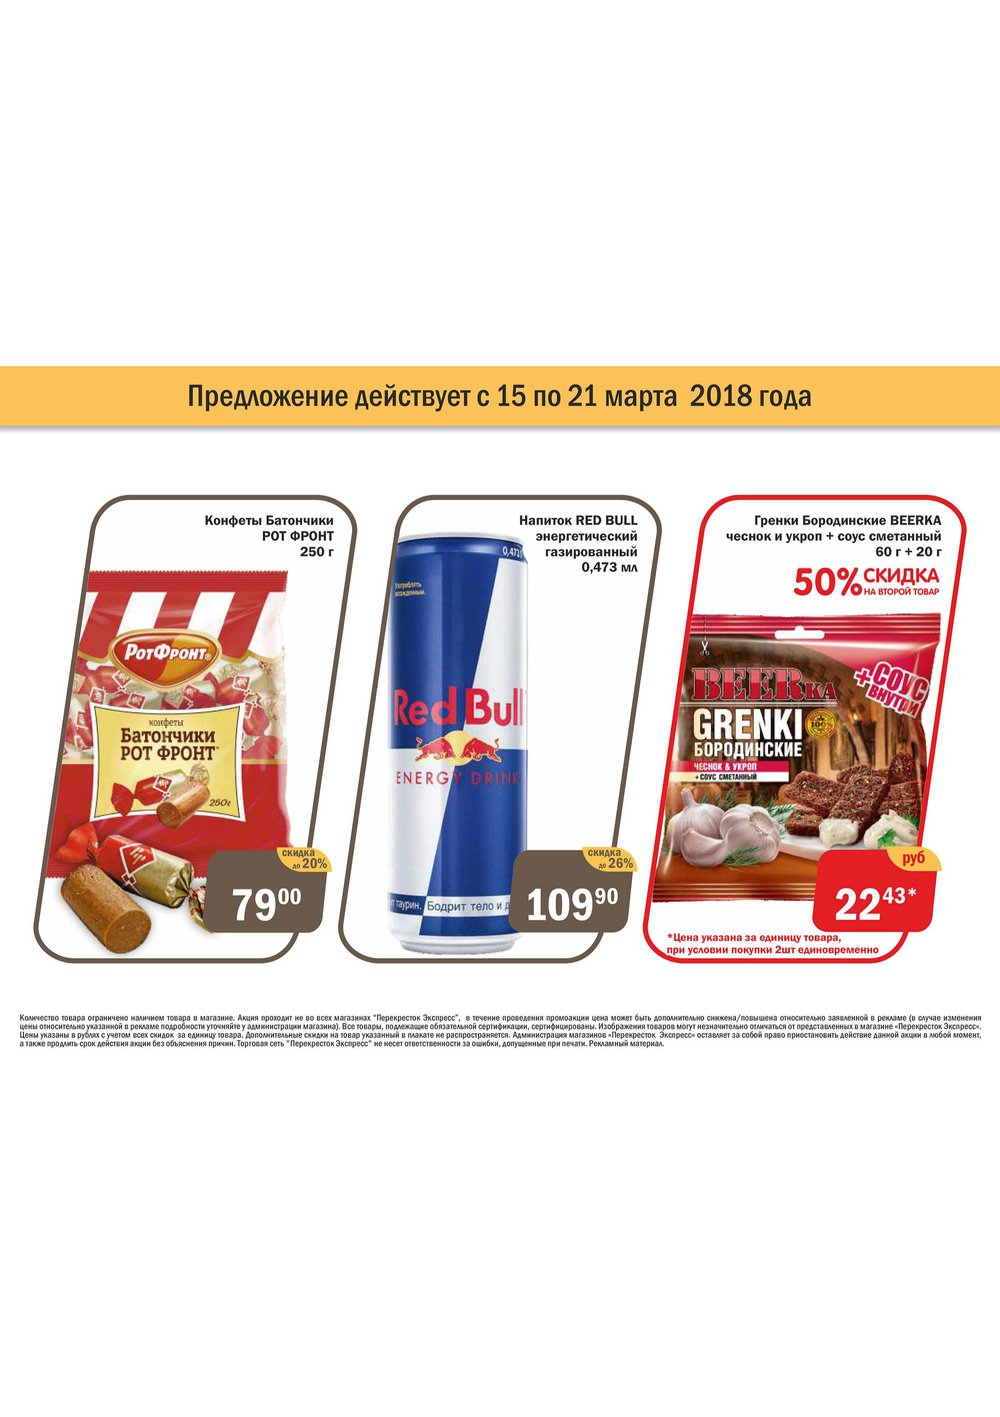 Каталог акций Перекресток экспресс с 15 по 21 марта 2018 - стр. 2